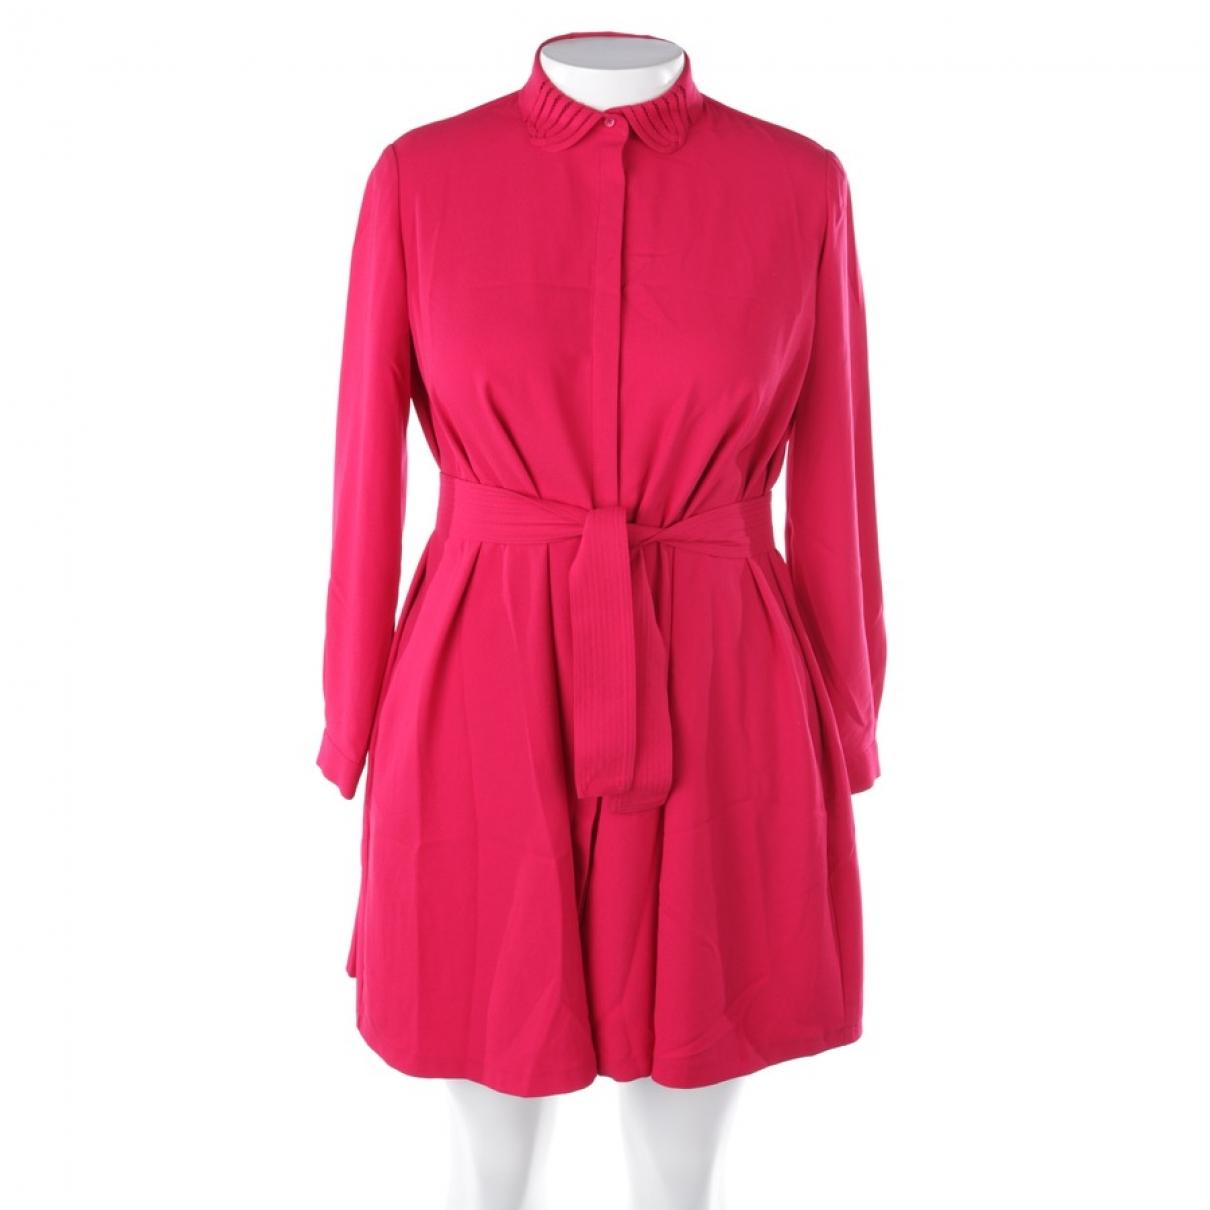 Maje \N Red dress for Women 40 FR